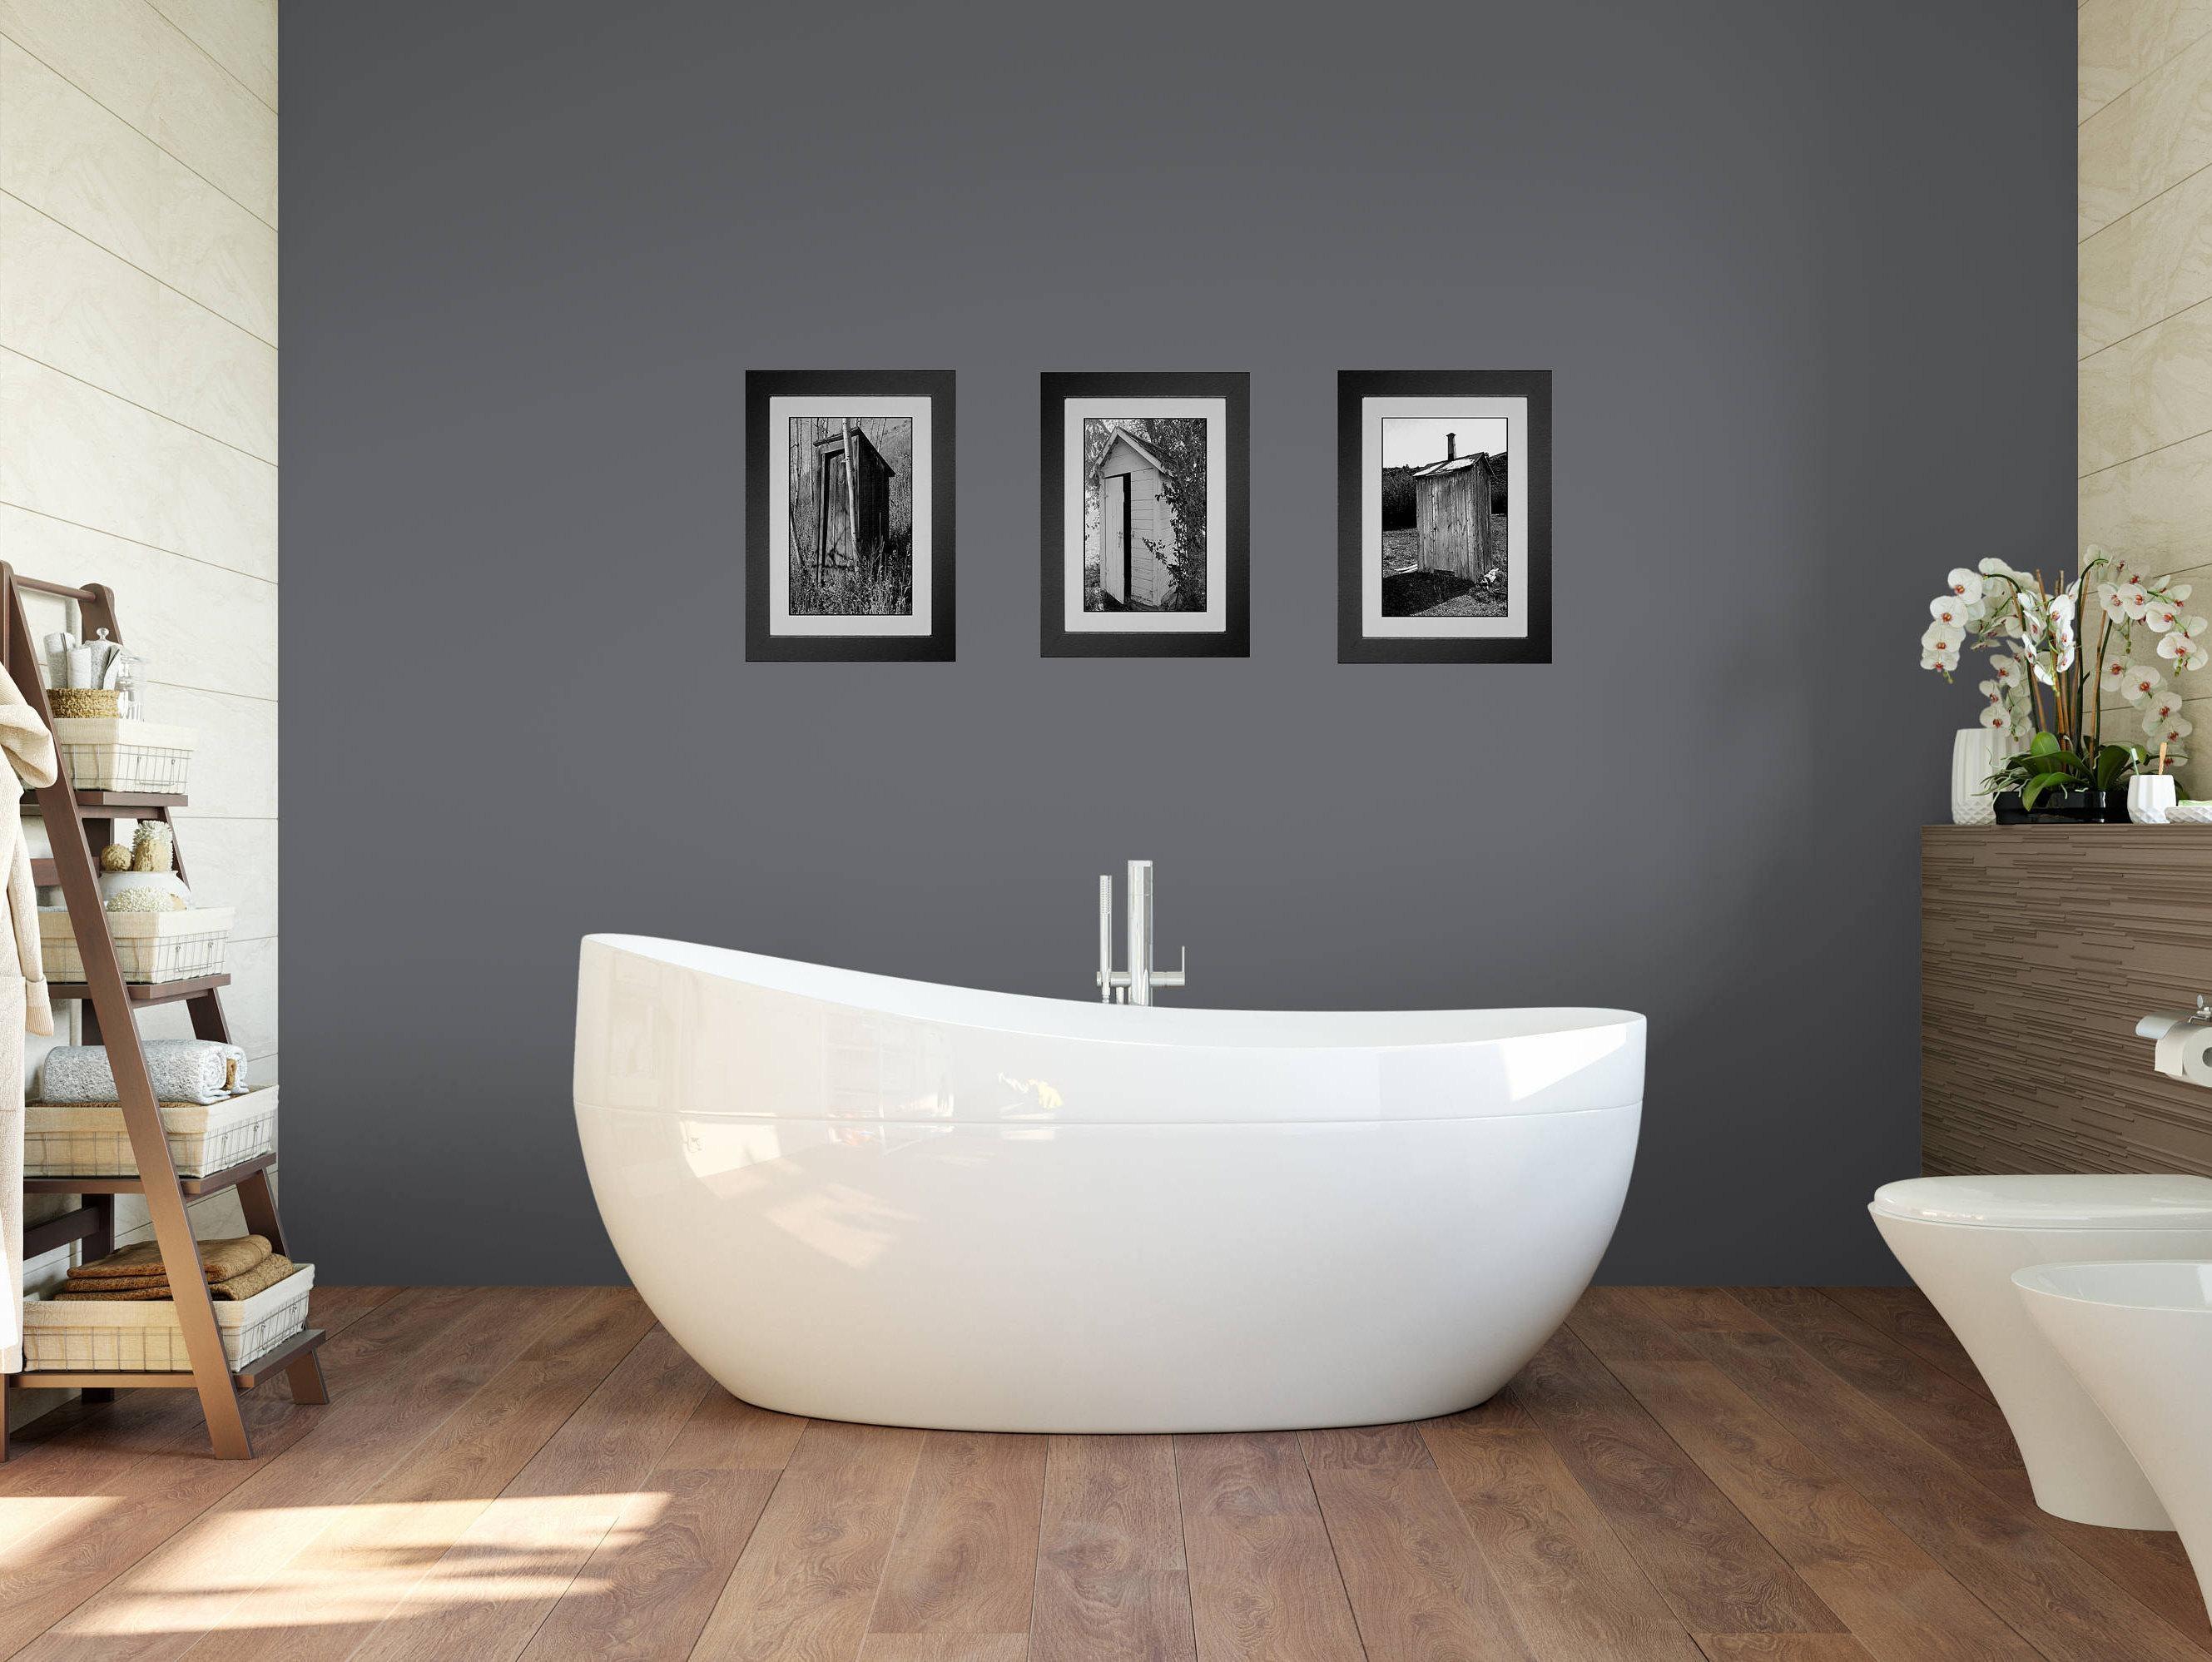 Funny Bathroom Art, Bathroom Wall Art, 3 Print Set, Framed Prints Inside Black And White Framed Wall Art (Image 13 of 20)